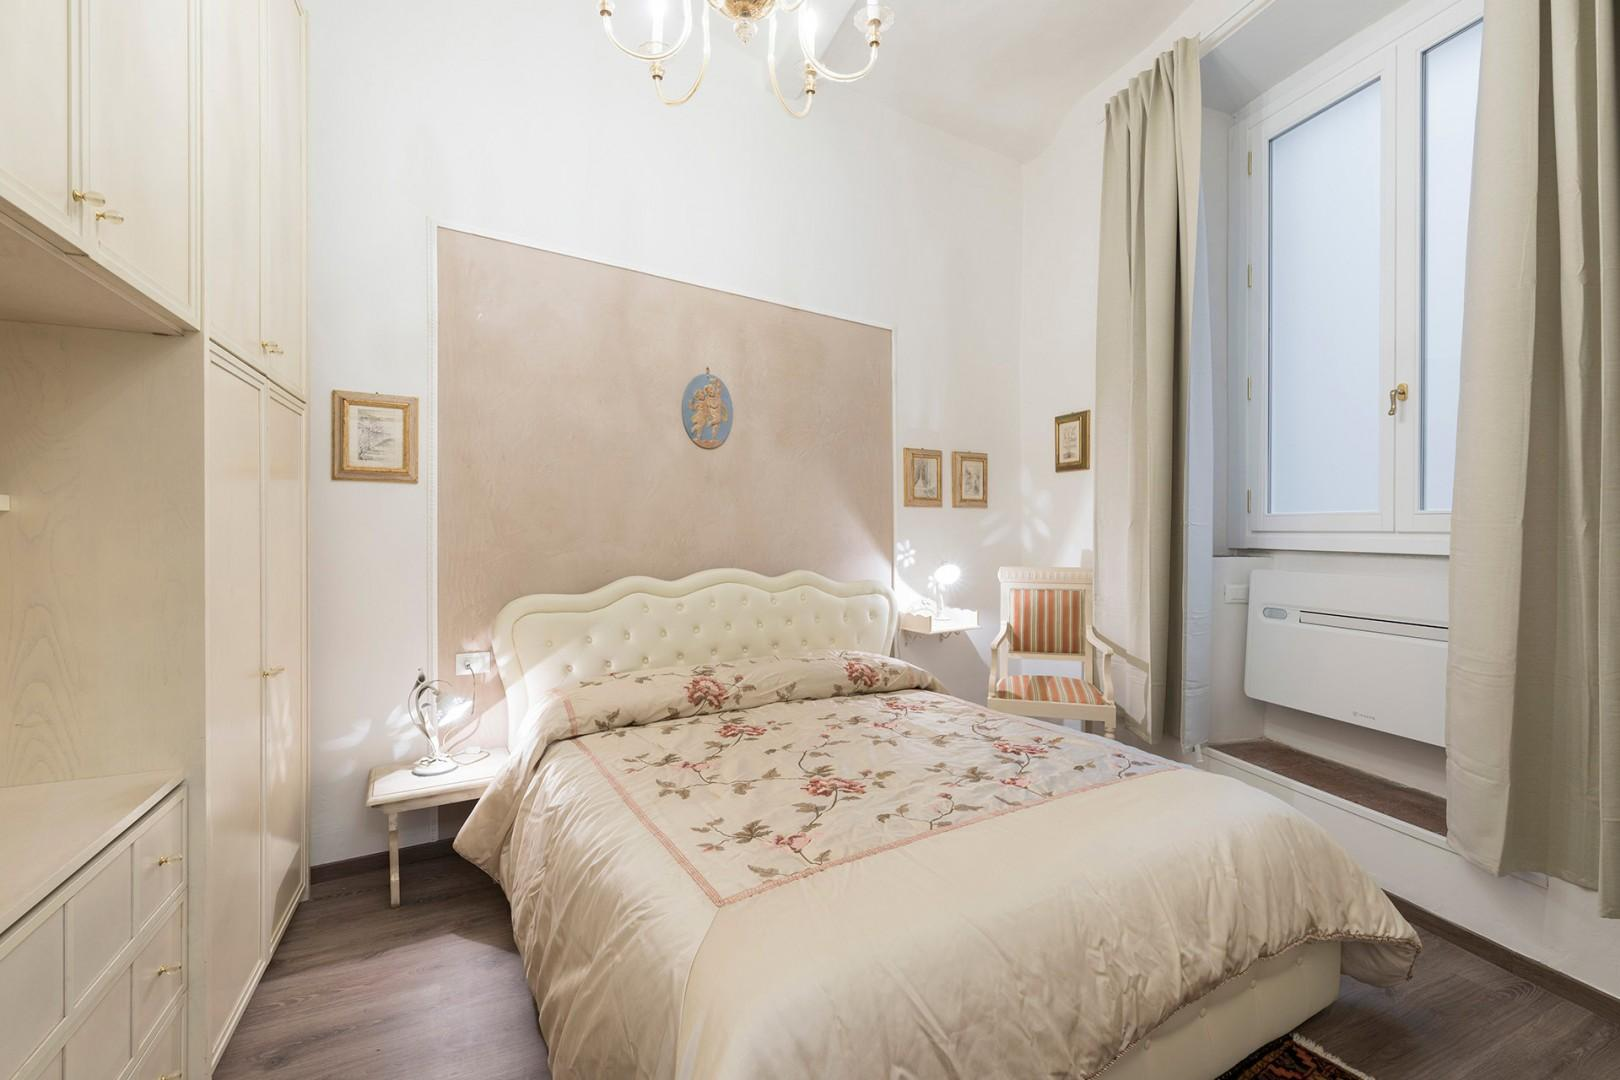 Elegantly furnished bedroom 1 has a large plush bed.